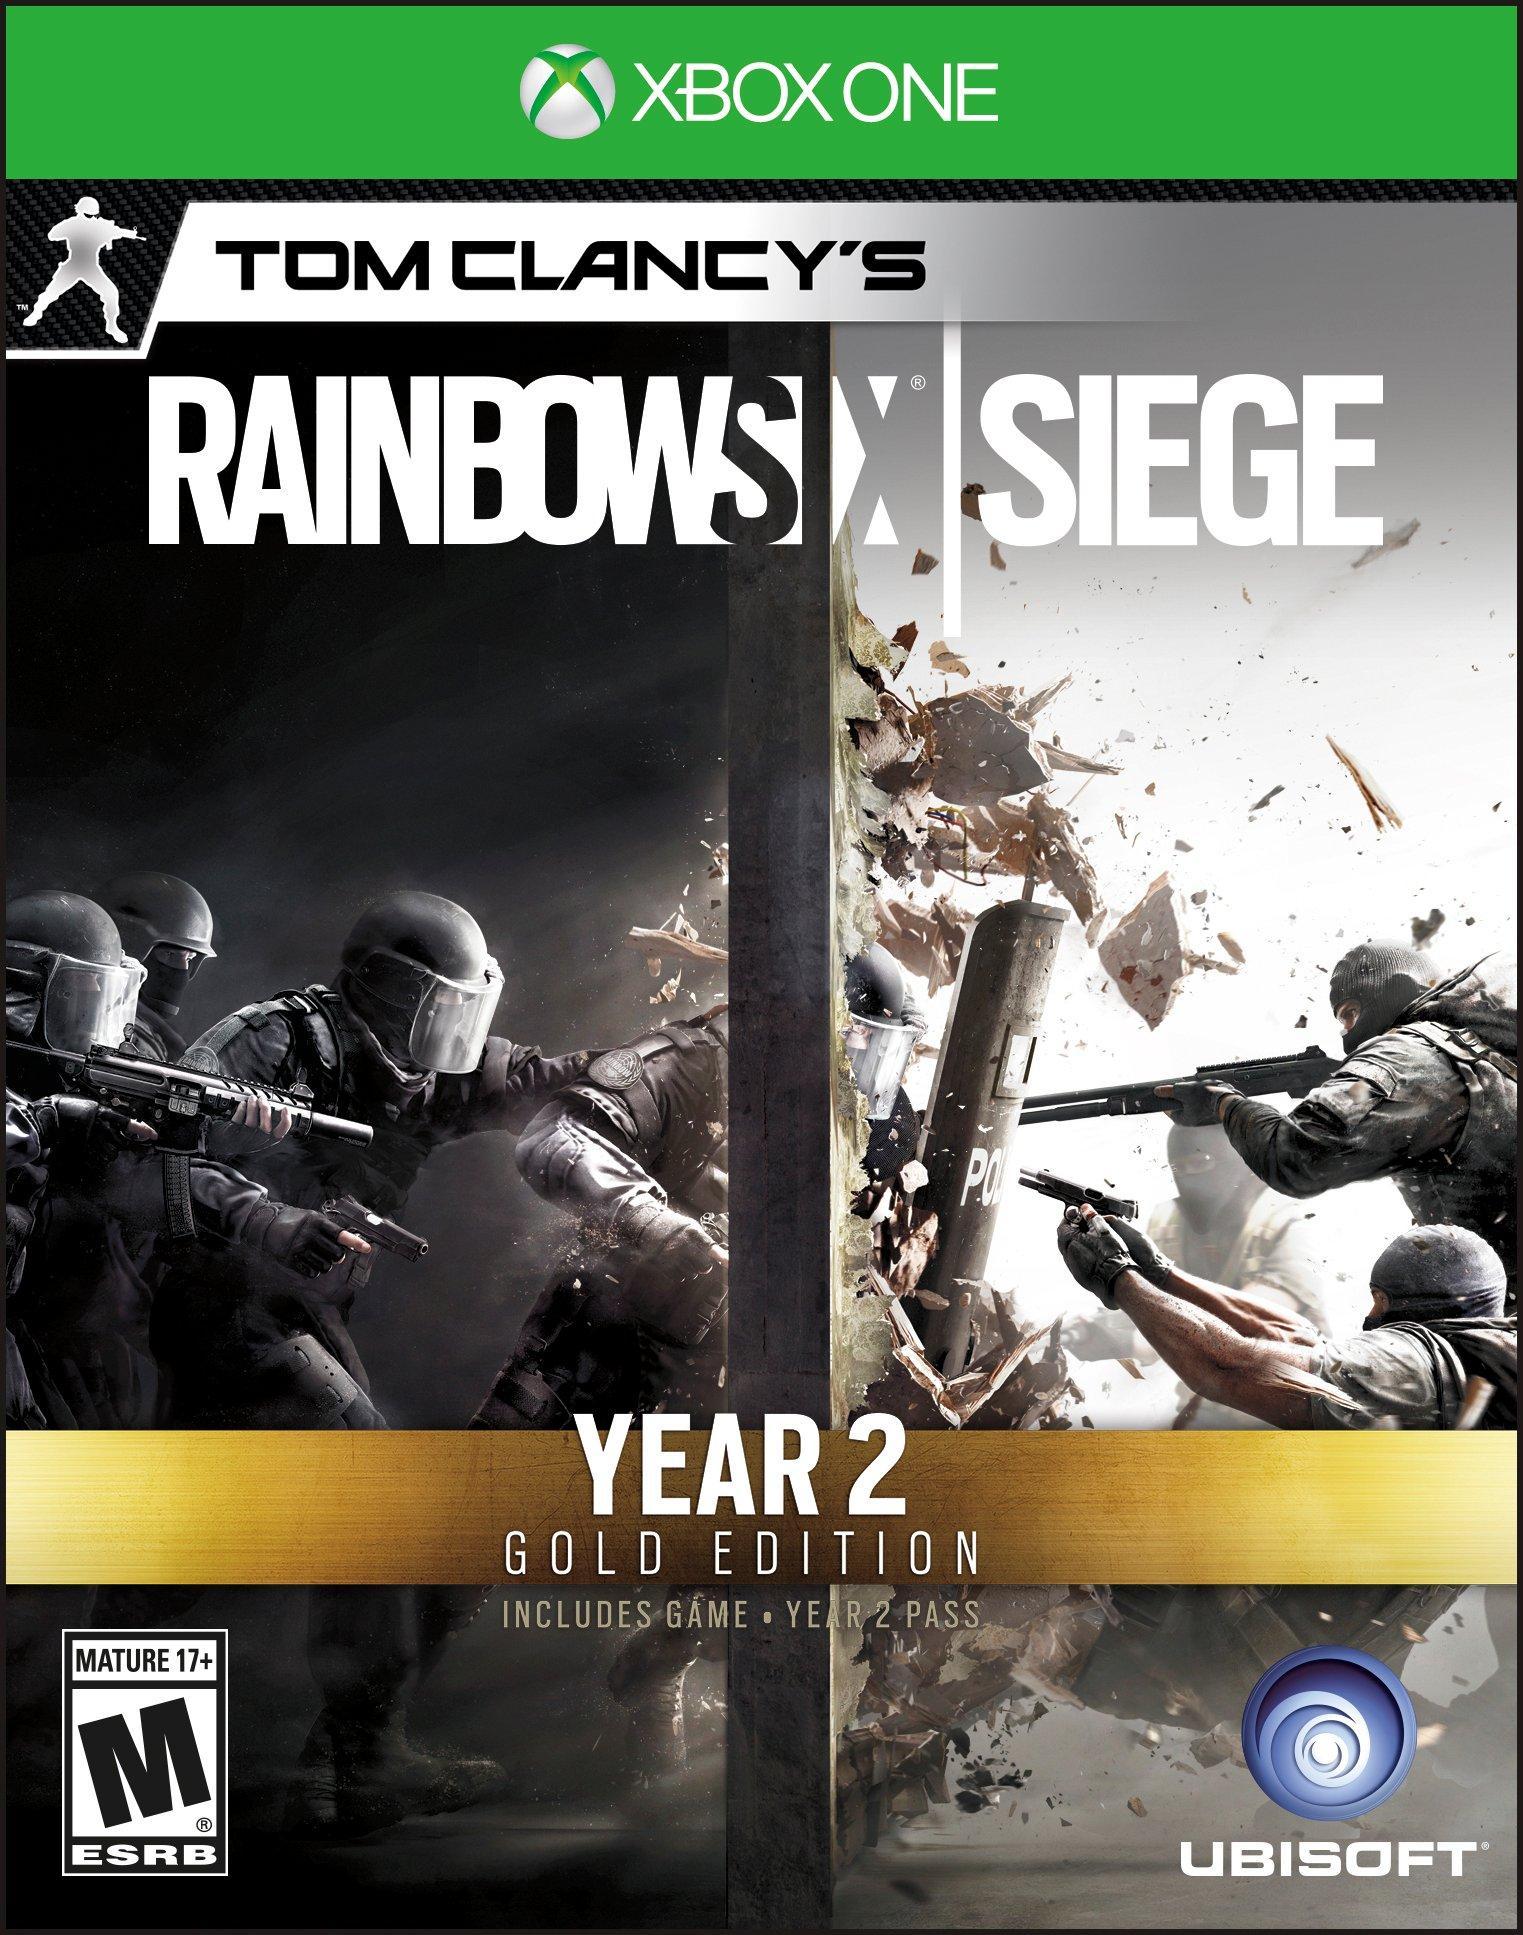 Tom Clancy's Rainbow Six: Siege Year 2 Gold Edition   Xbox One   GameStop